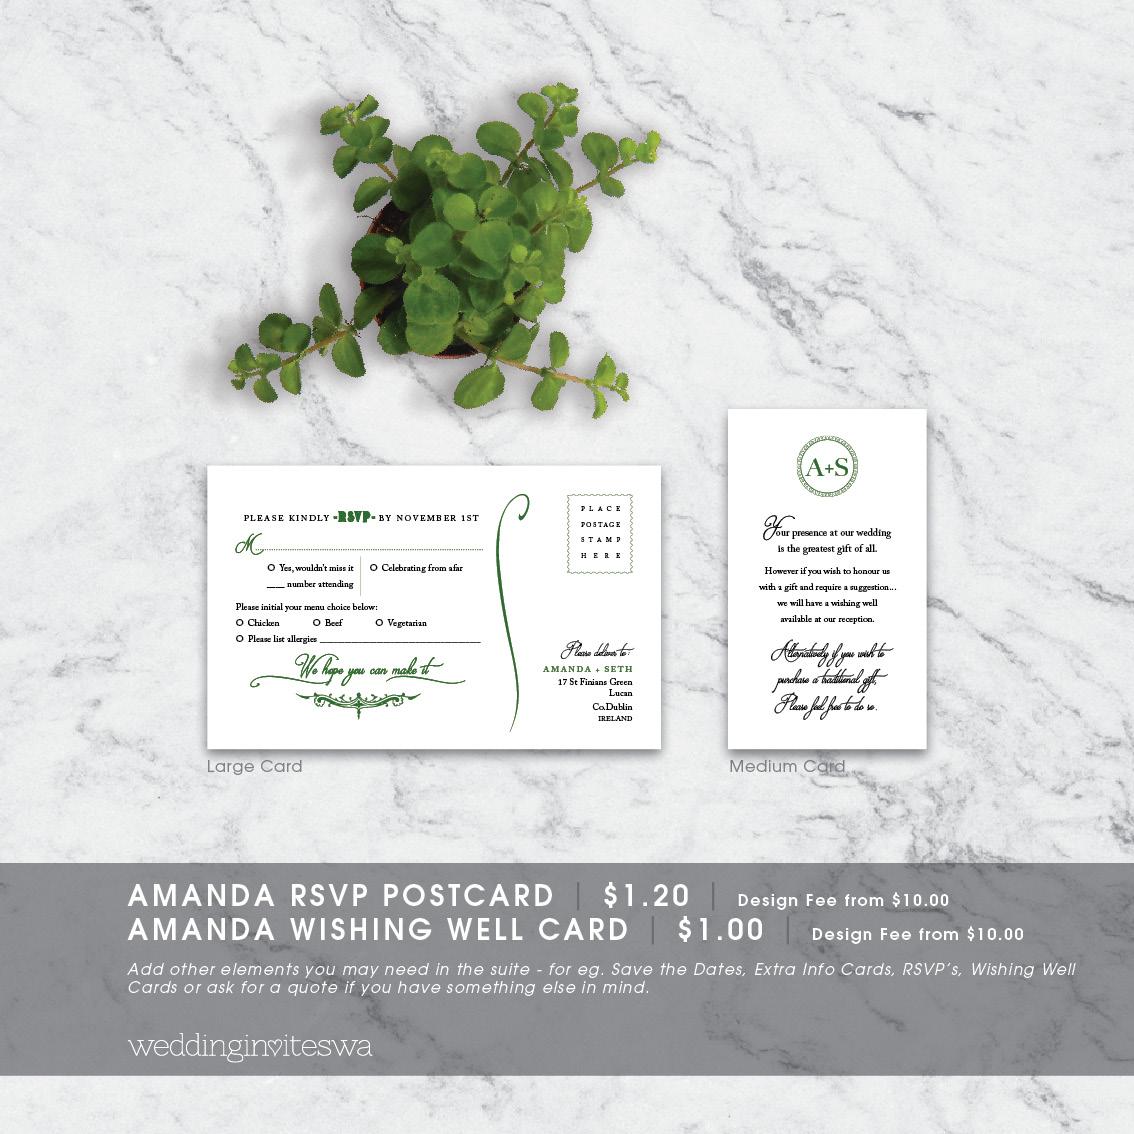 AMANDA_extra cards